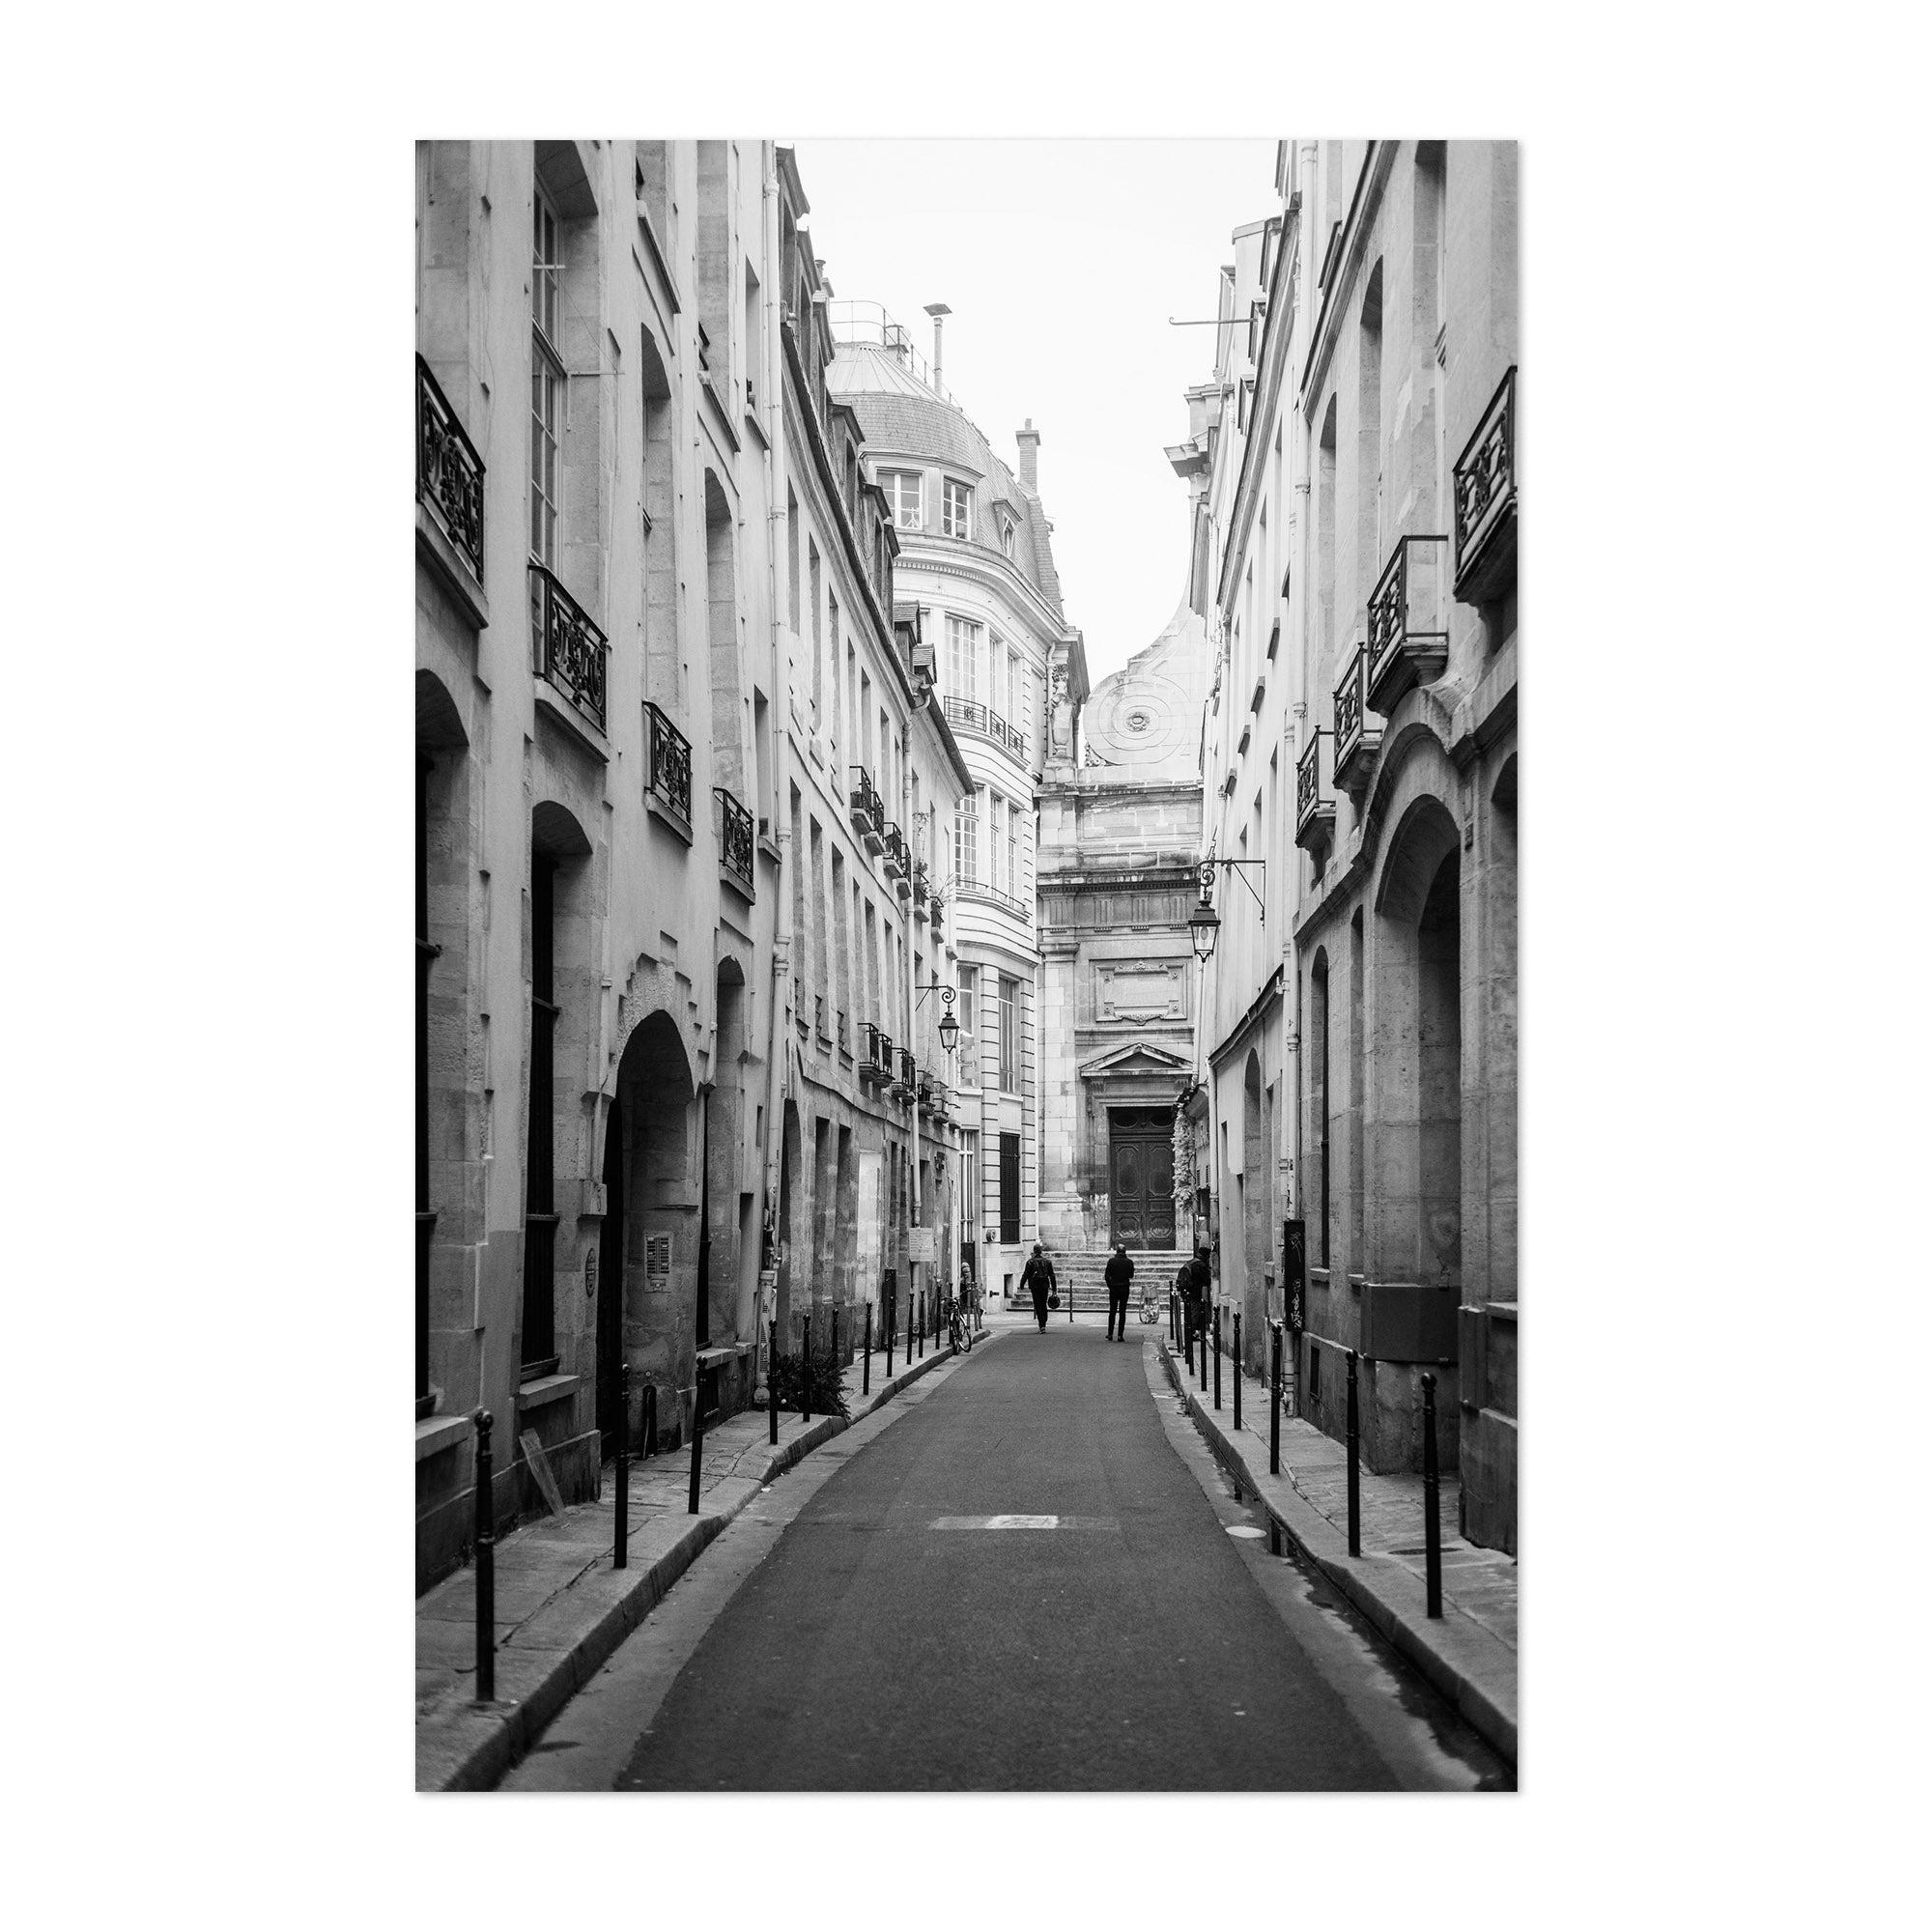 Shop noir gallery black white paris france photo unframed art print poster free shipping on orders over 45 overstock 27460942